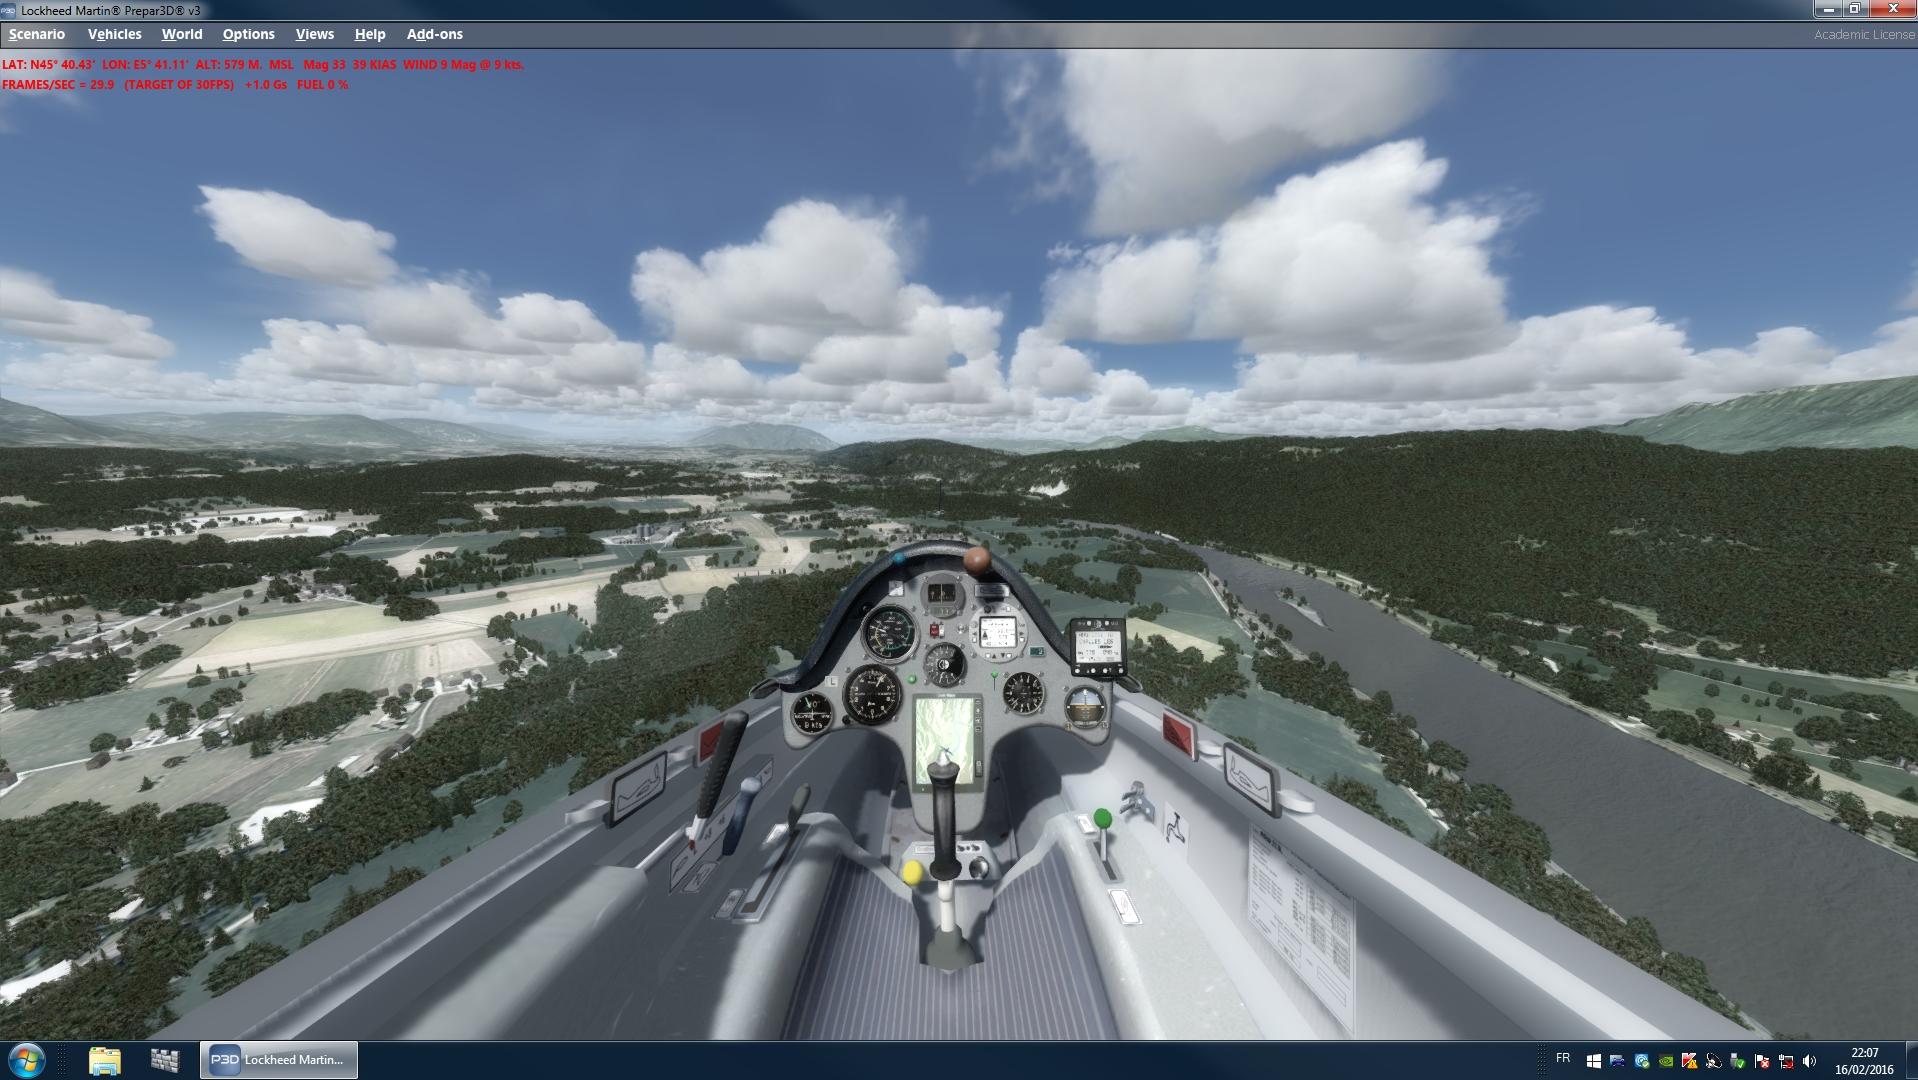 http://www.pilote-virtuel.com/img/gallery/1455866244.jpg